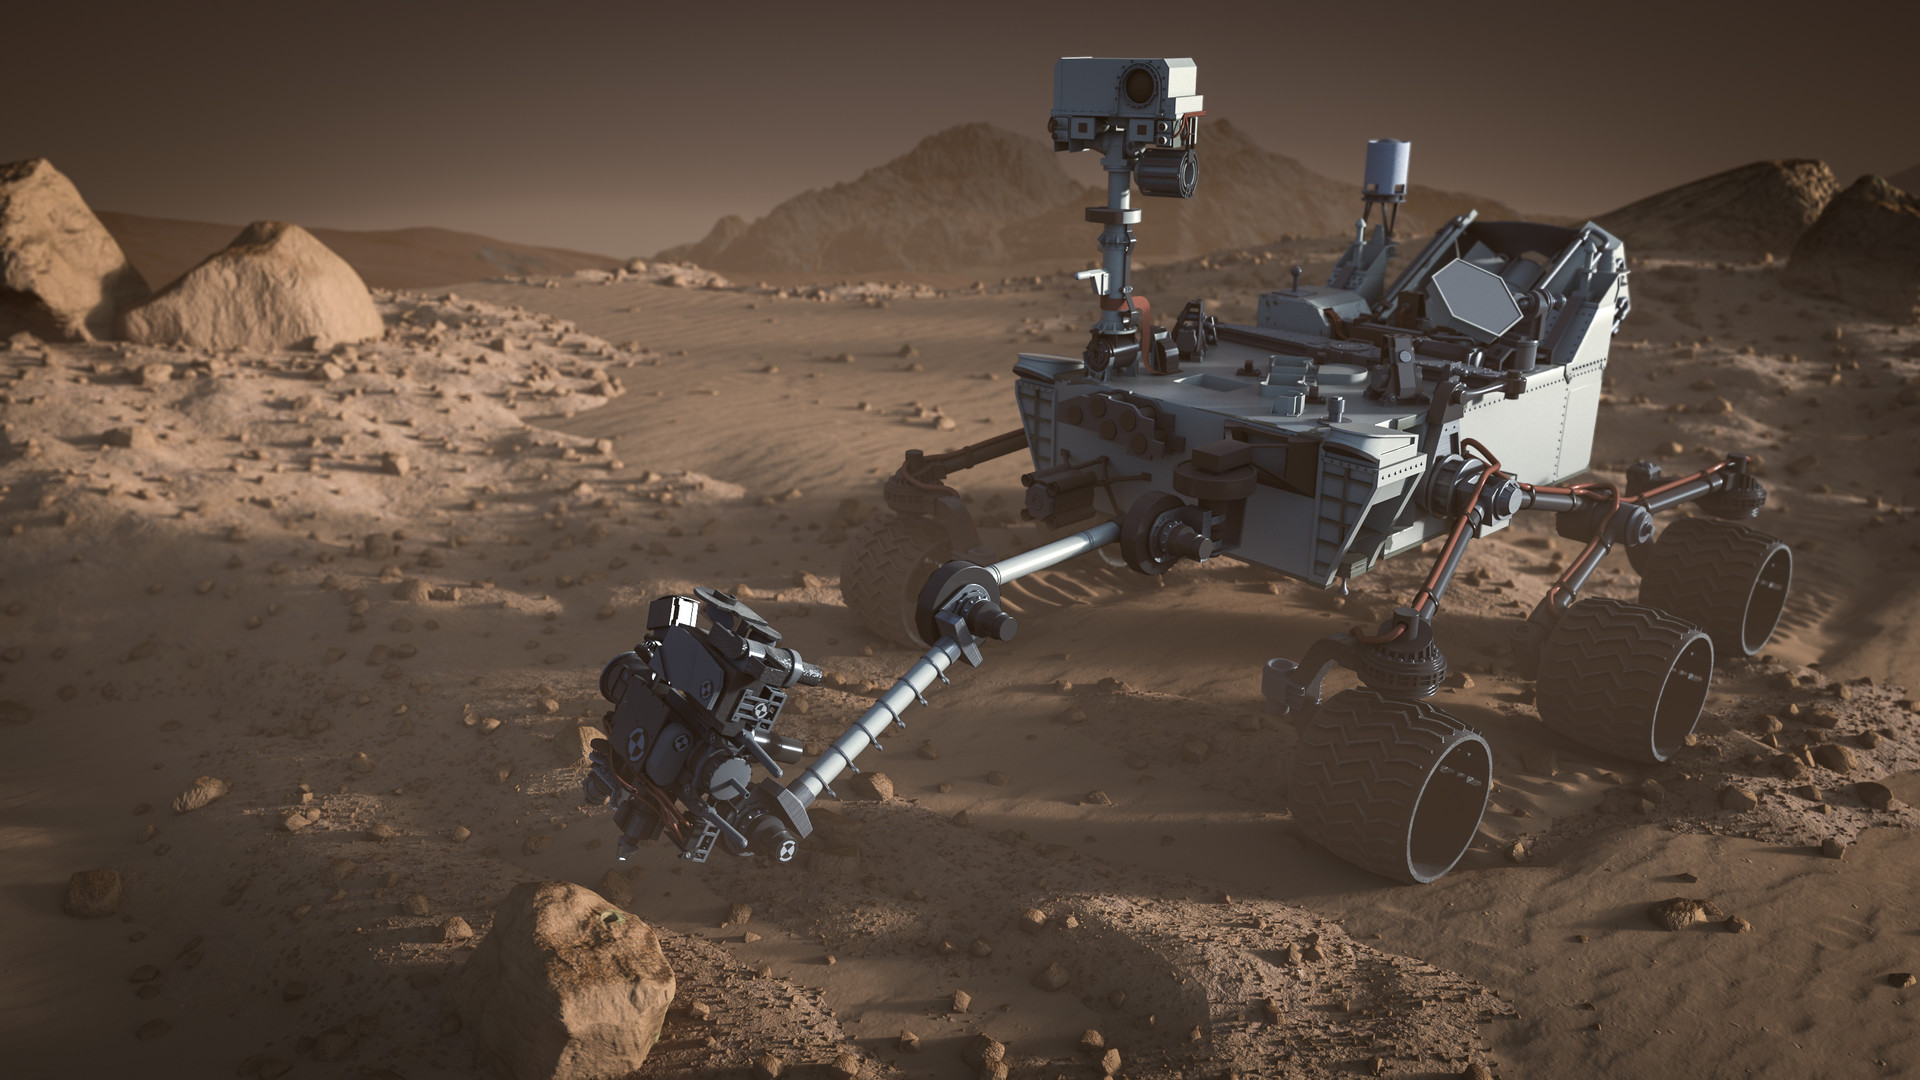 curiosity mars mission - HD1920×1080